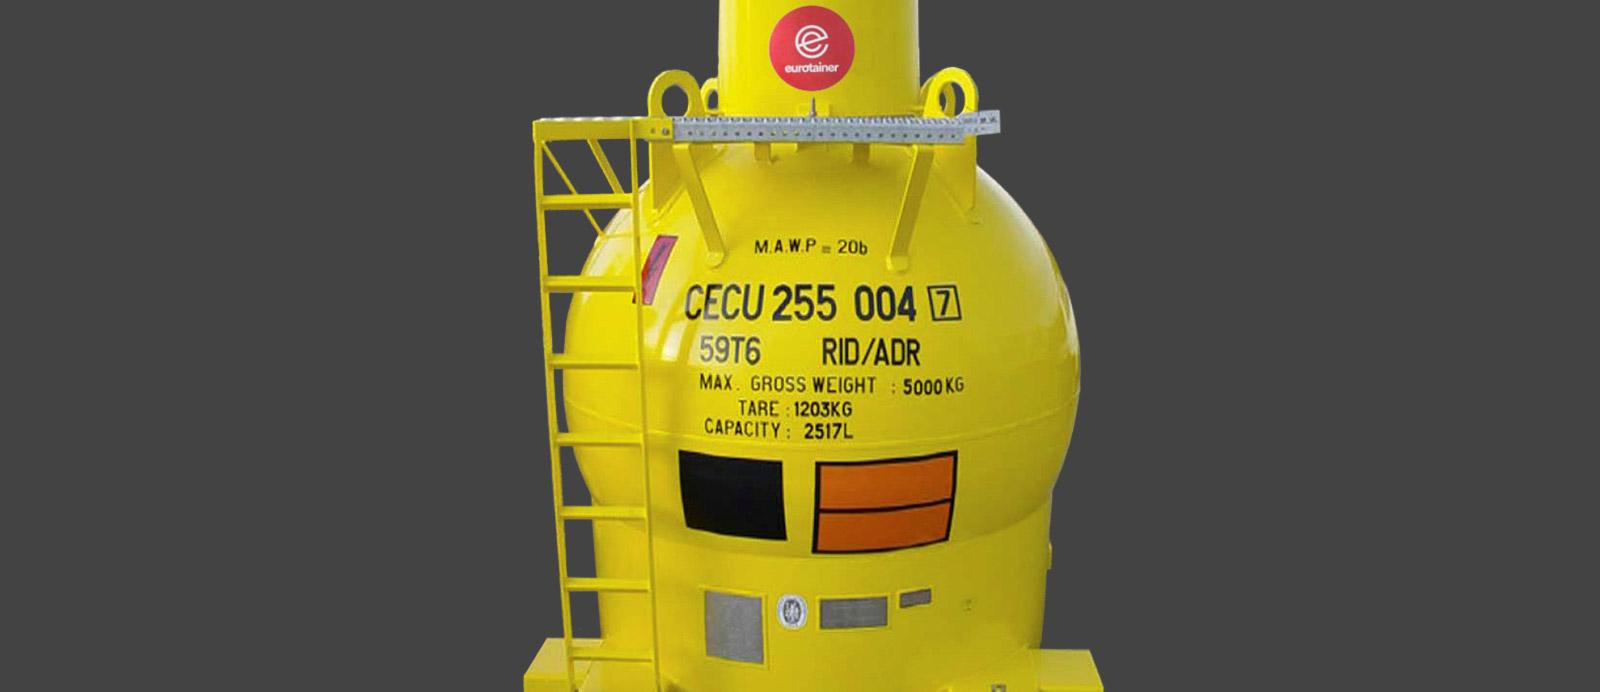 High Pressure Sphere   Eurotainer